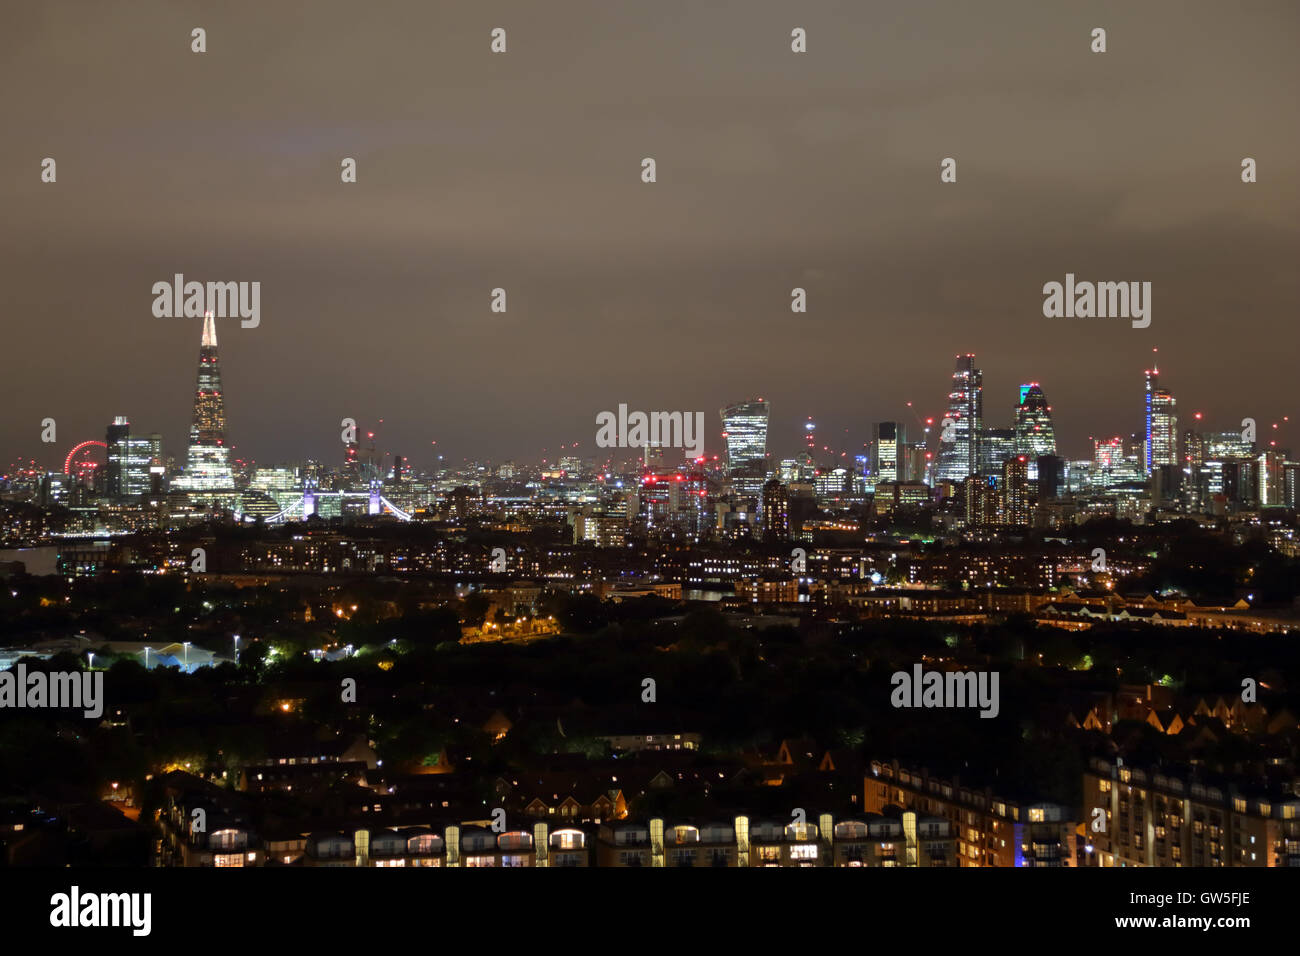 night skyline view of - photo #47